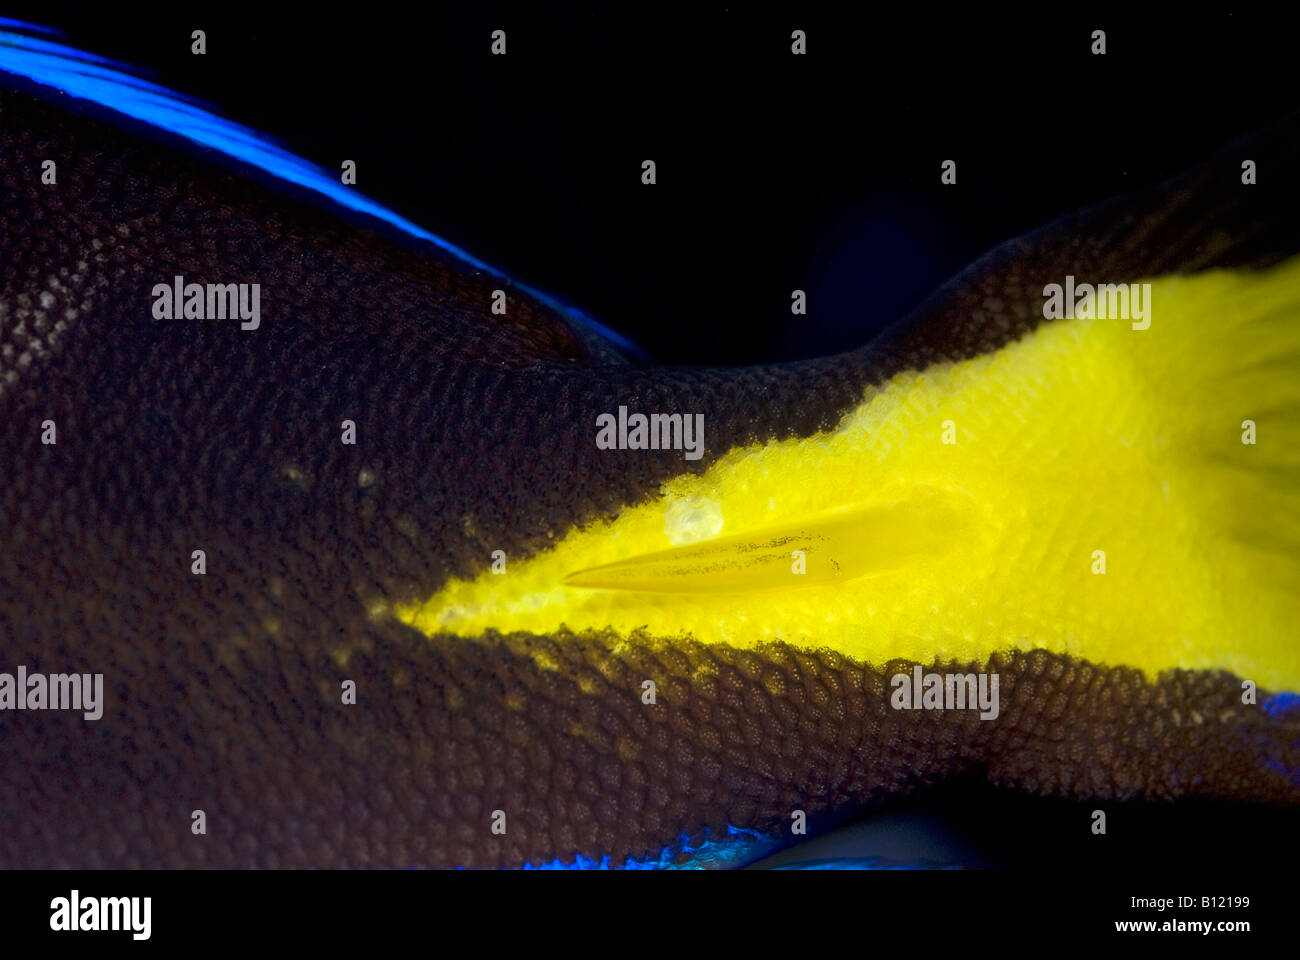 Sting of Blue Tang, Blue Hippo Tang or Palete Surgeonfish (Paracanthurus hepatus), Acanthuridae - Stock Image